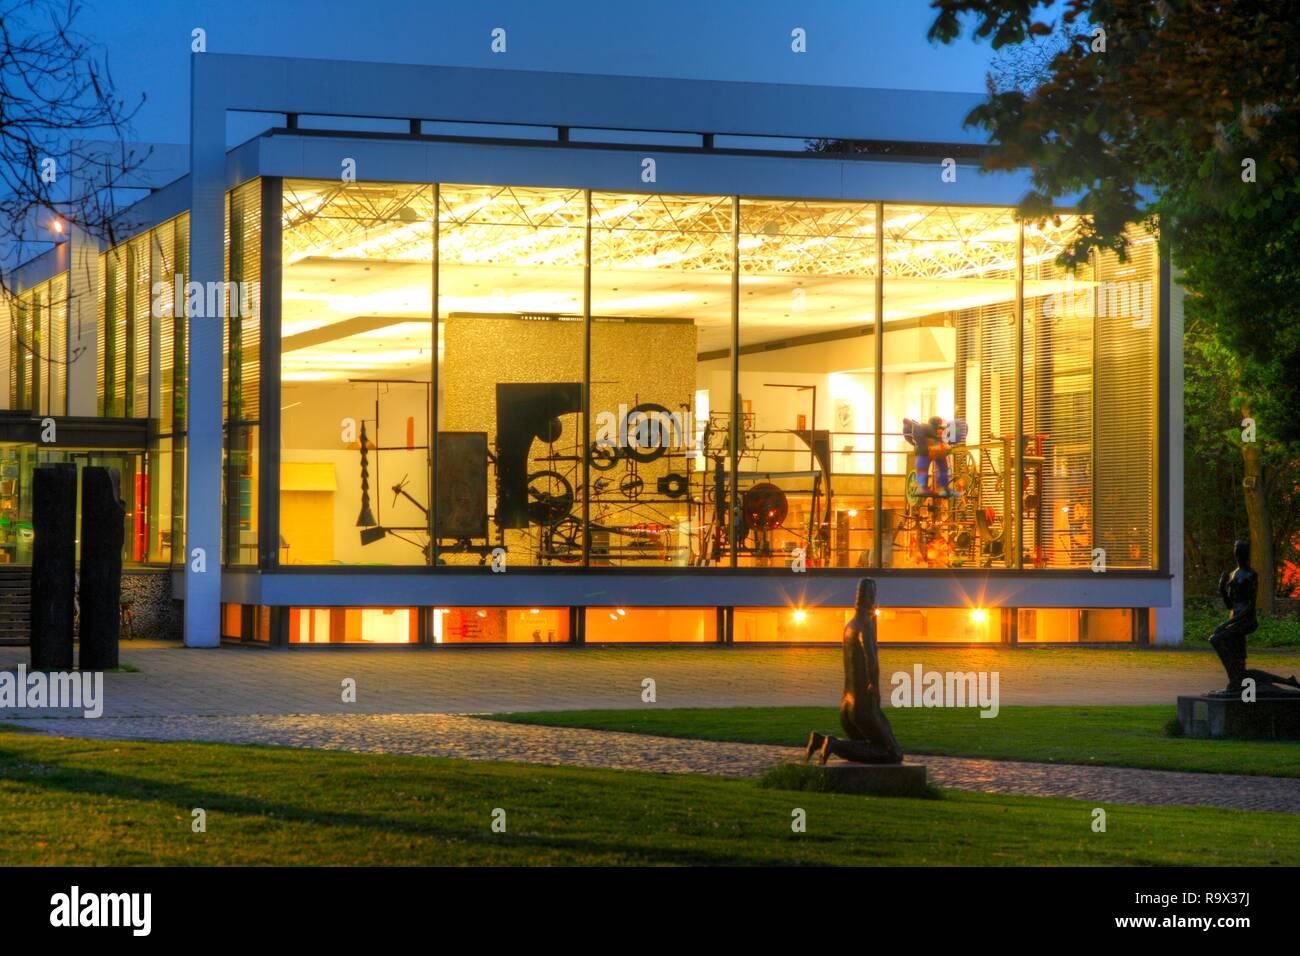 DEU, Deutschland, Duisburg : Wilhelm Lehmbruck Museum bei abenddaemmerung | DEU, Germany, Duisburg : Wilhelm Lehmbruck Museum at dusk - Stock Image